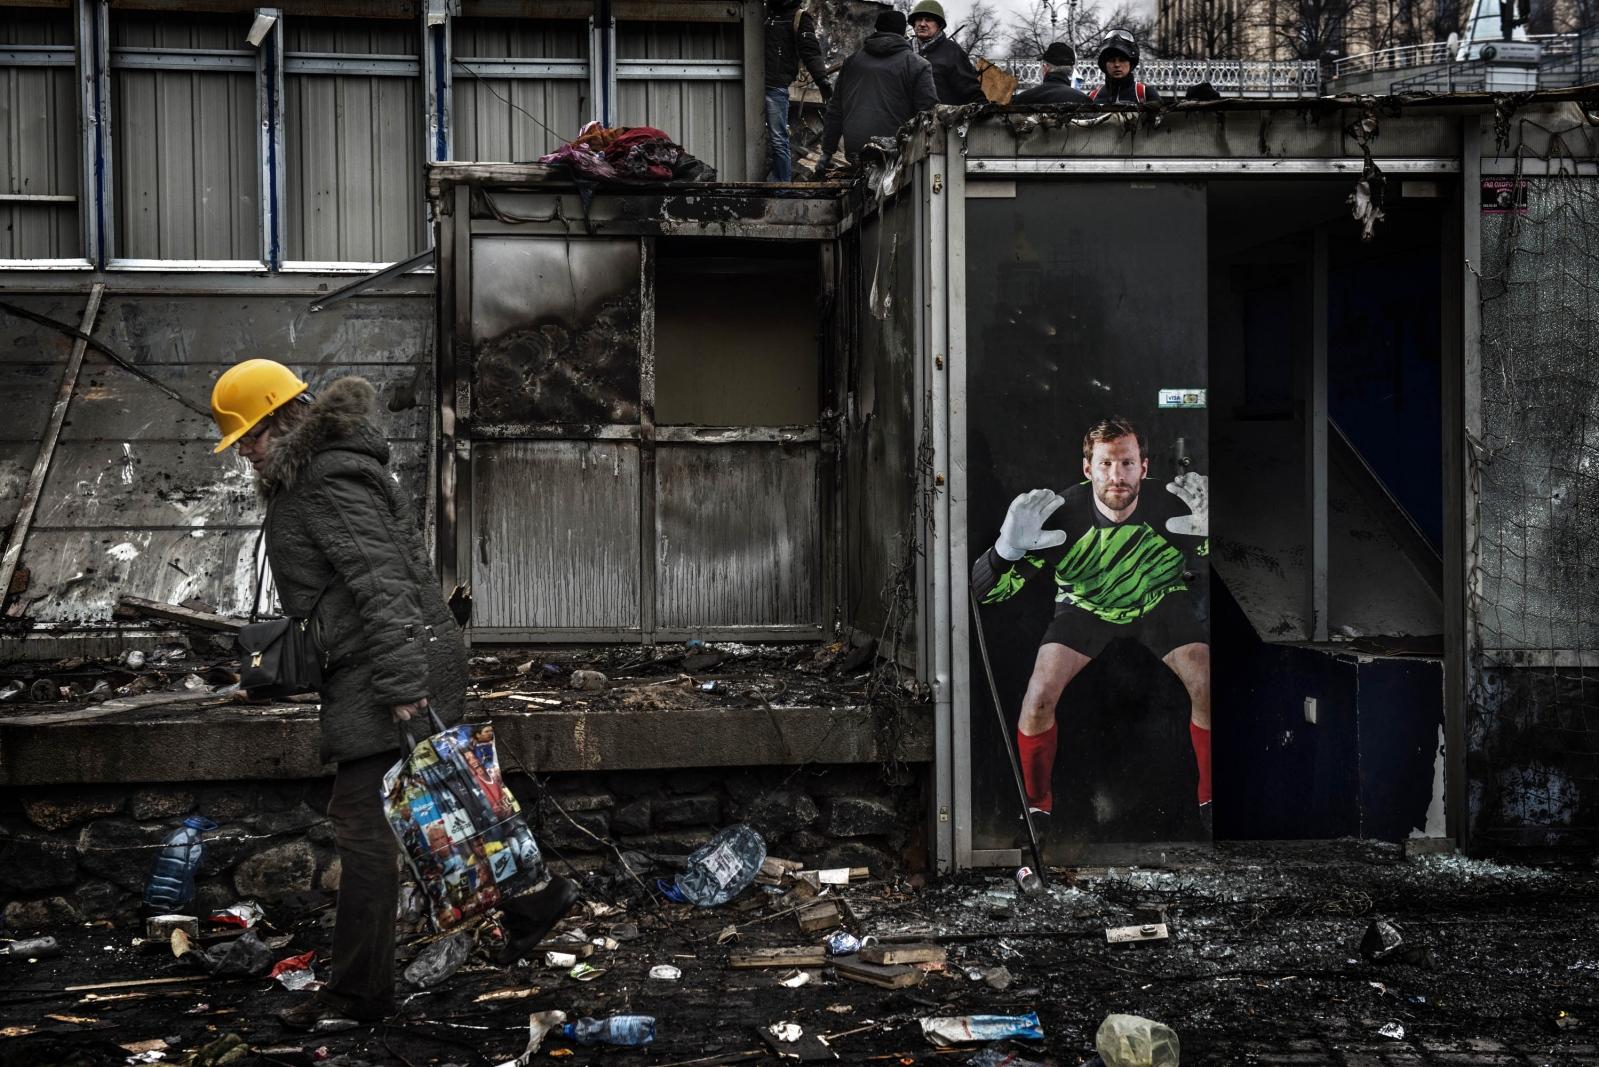 Art and Documentary Photography - Loading Behind_Kiev_s_barricades_041.jpg